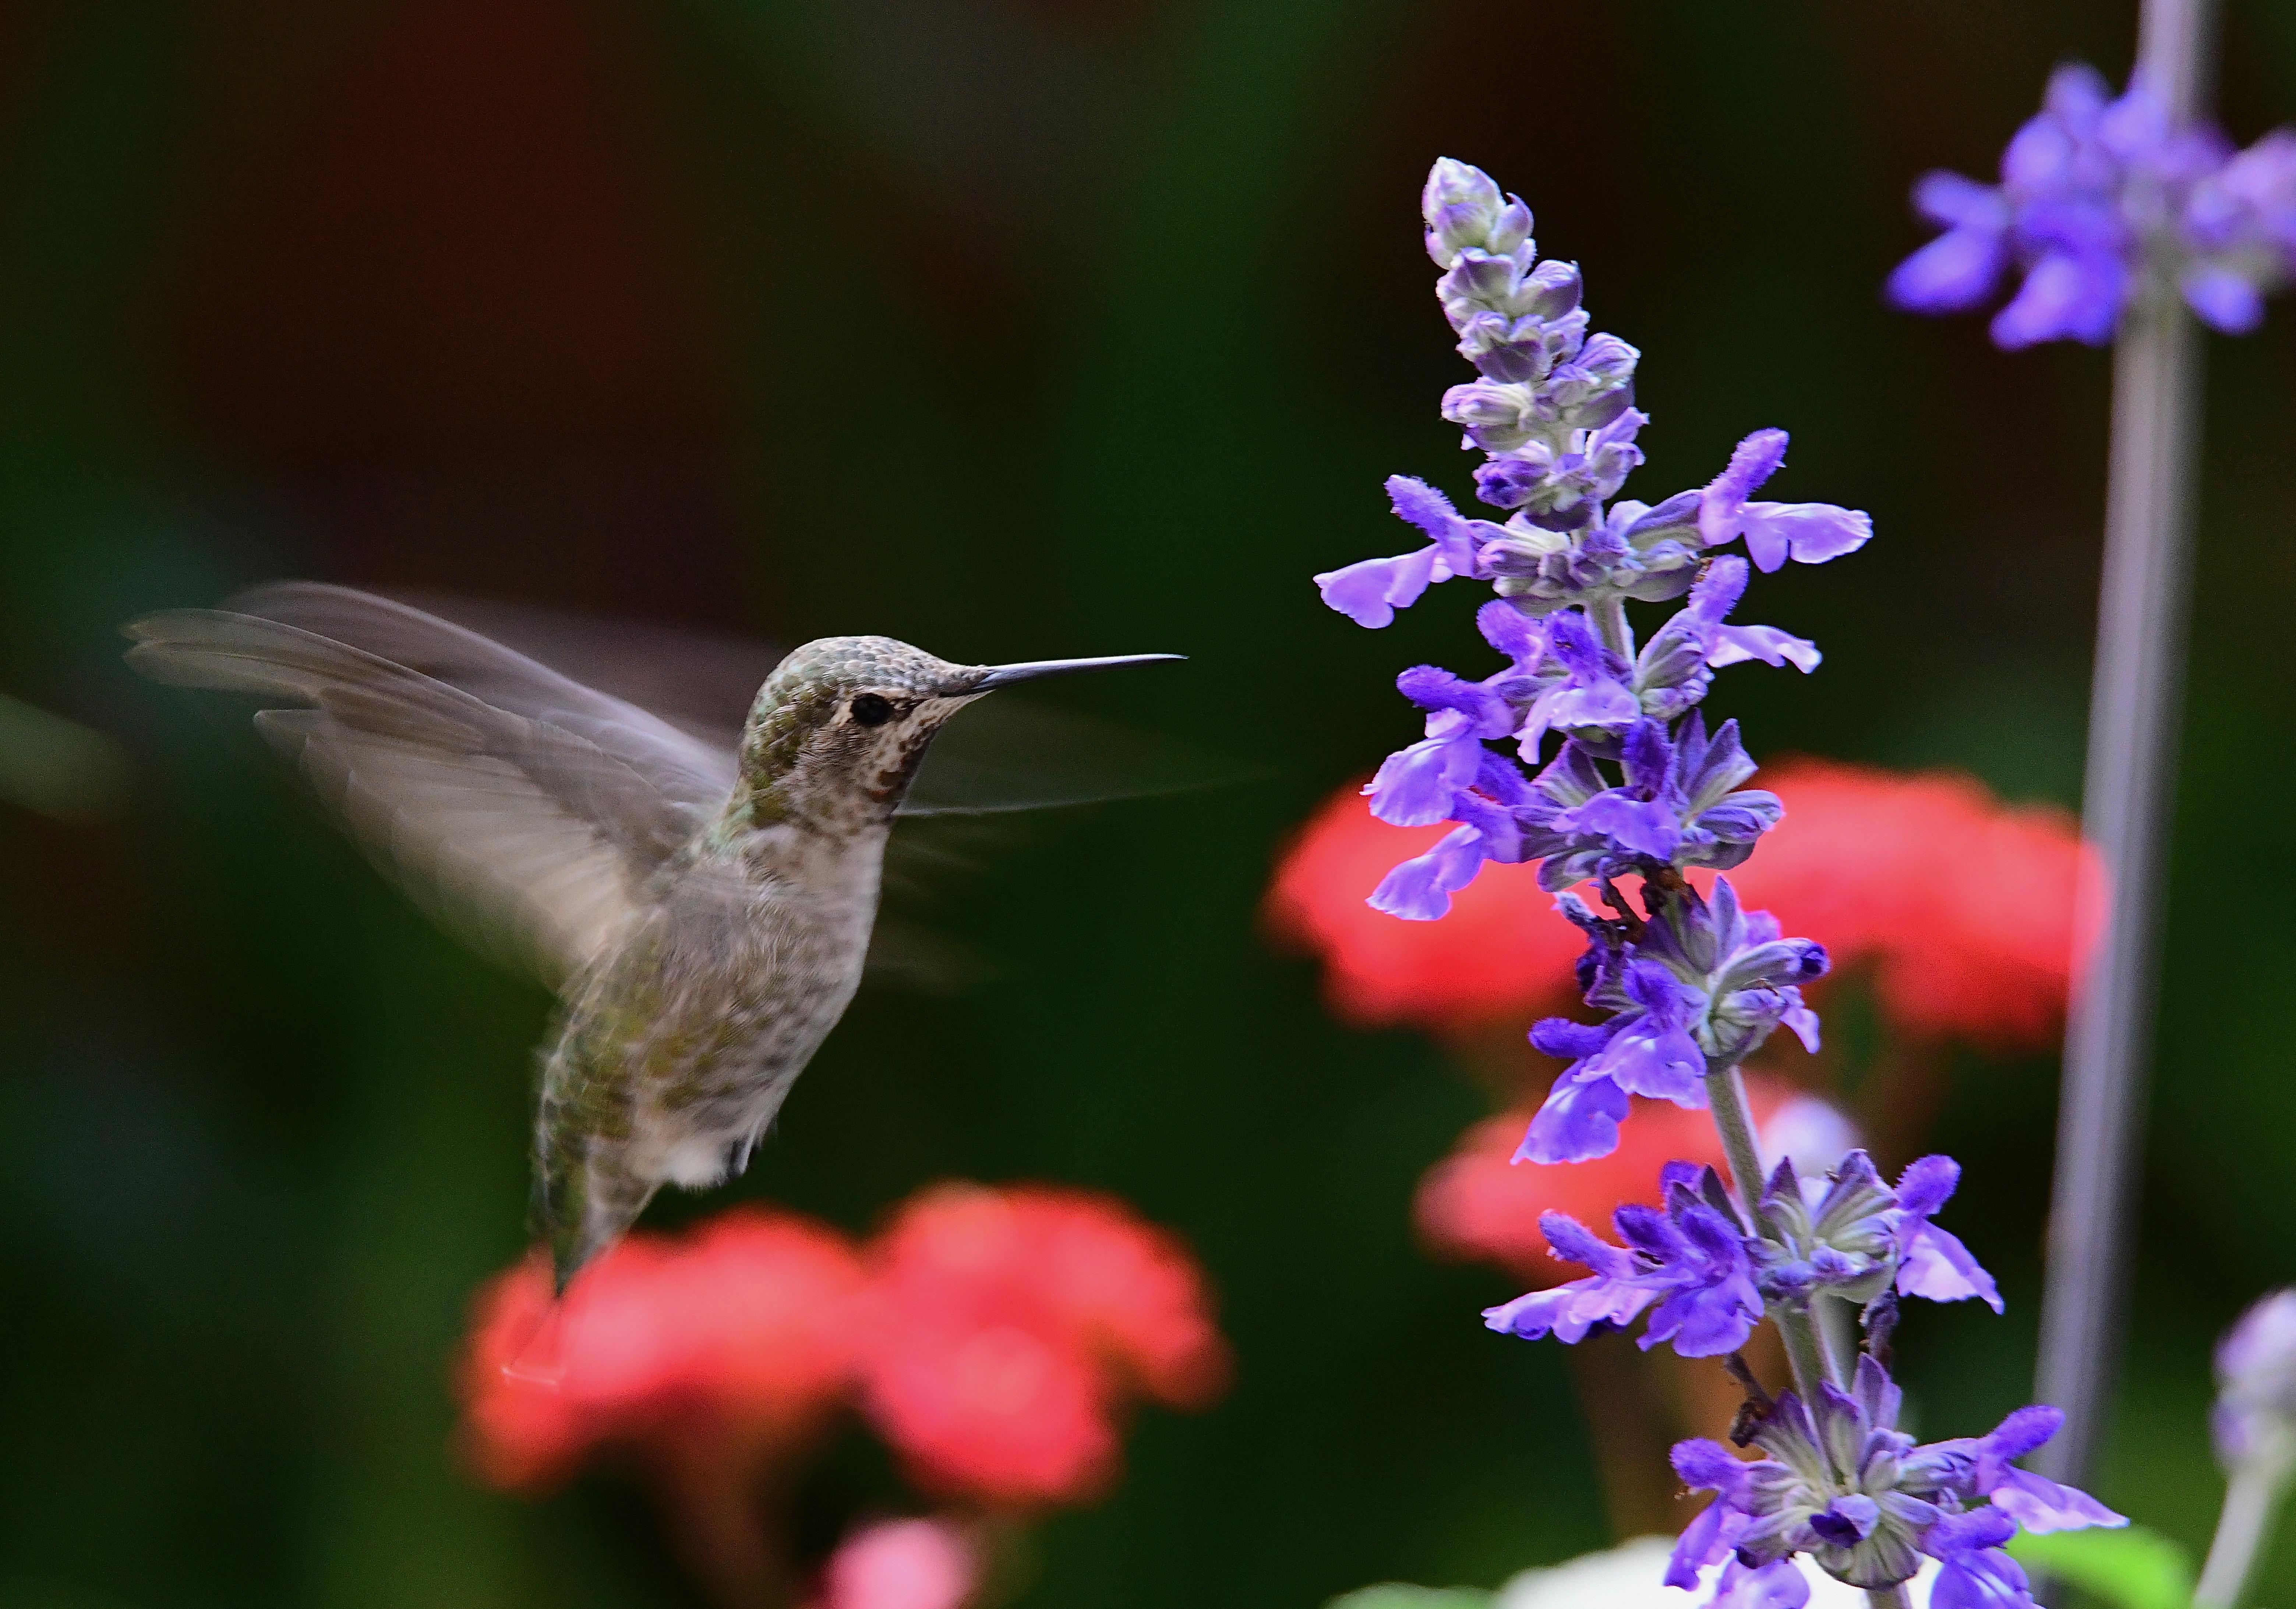 Anna's Hummingbird with wing turbulence at Sunnyvale, CA